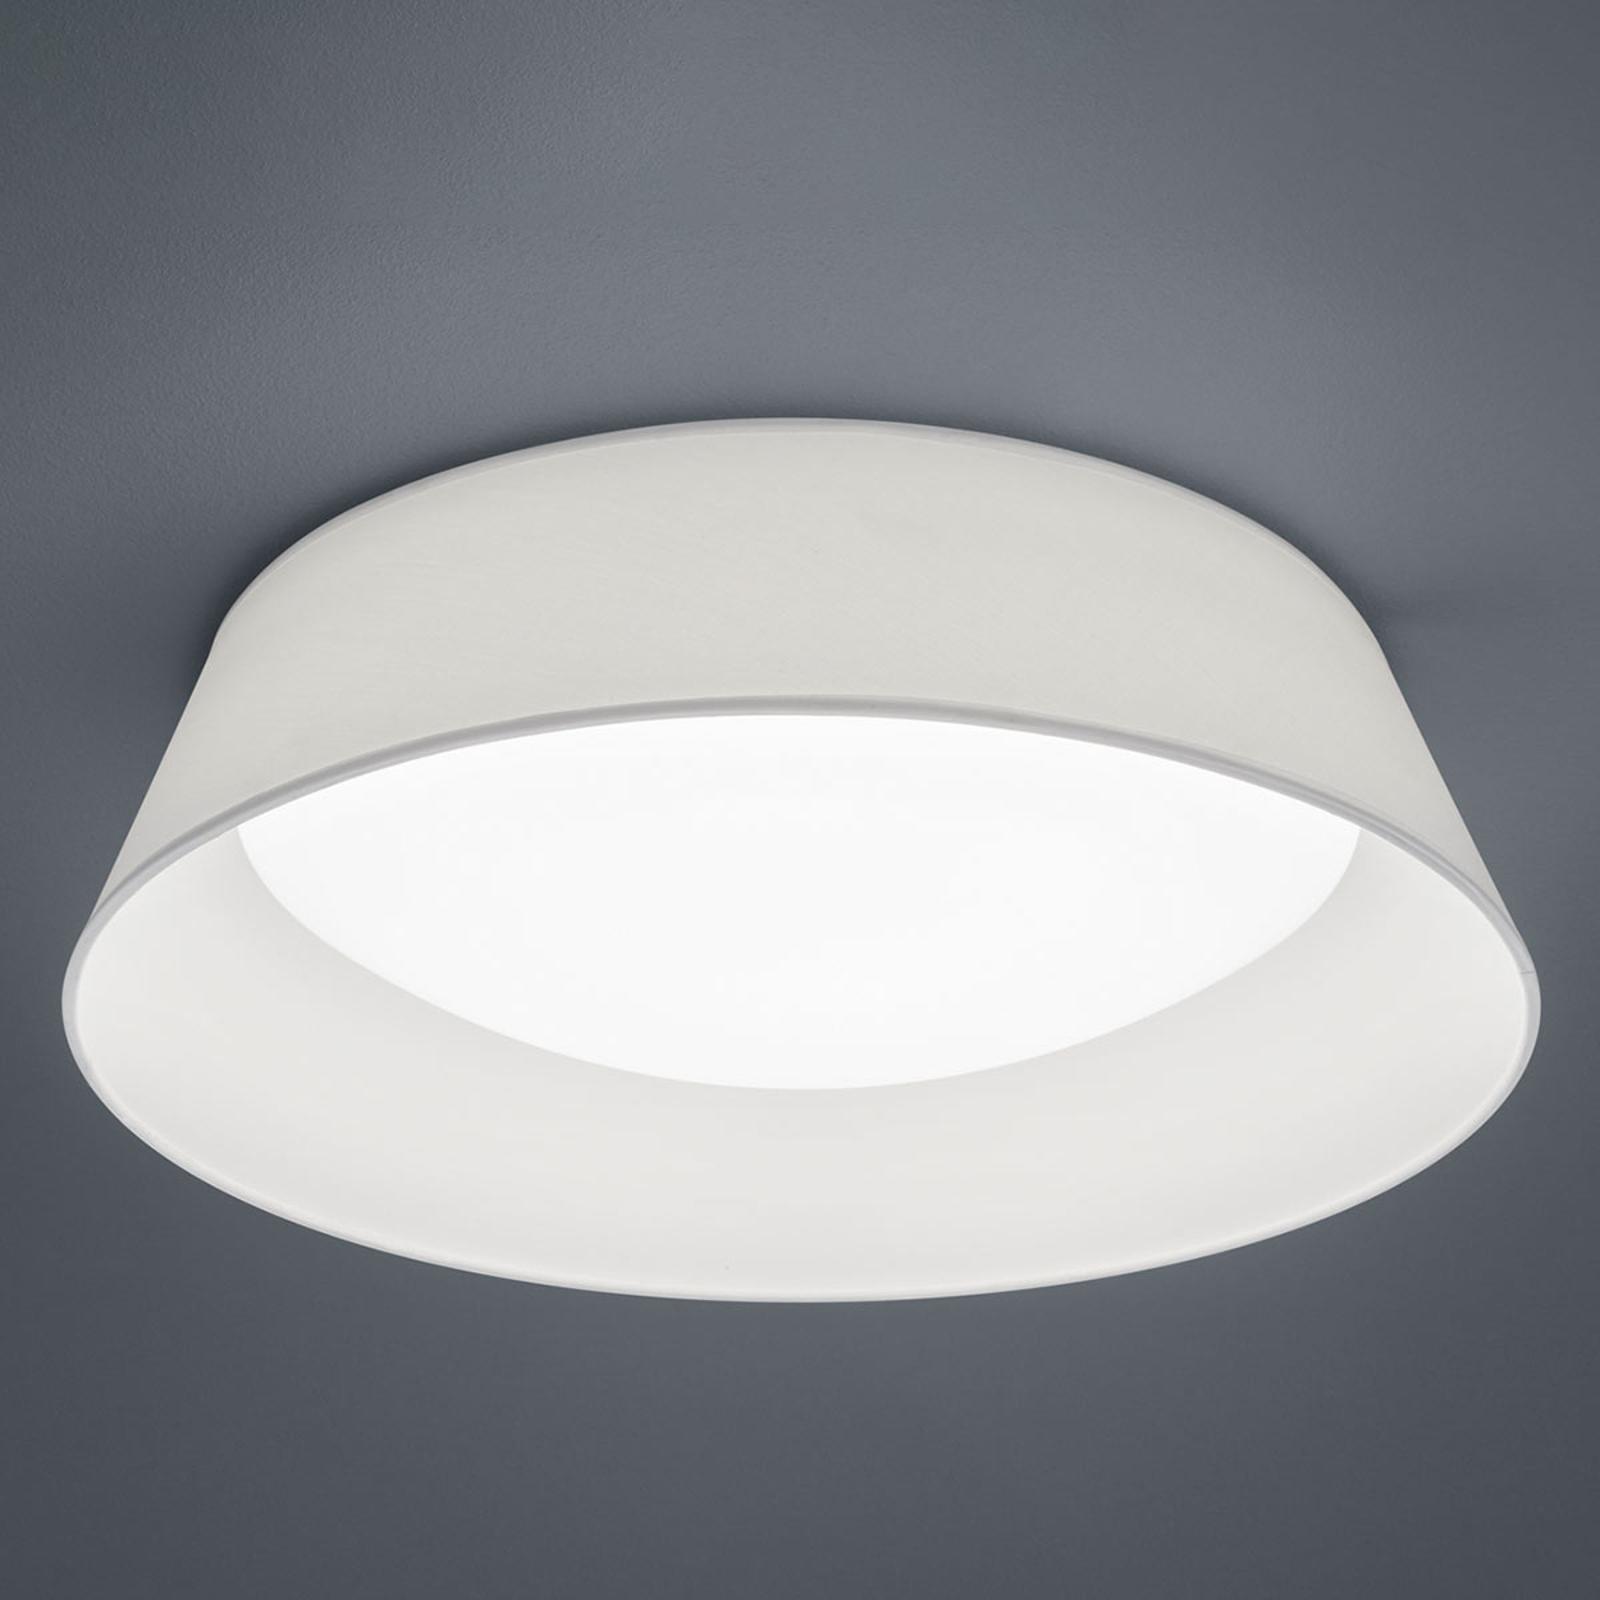 LED plafondlamp Ponts met witte textiel lampenkap